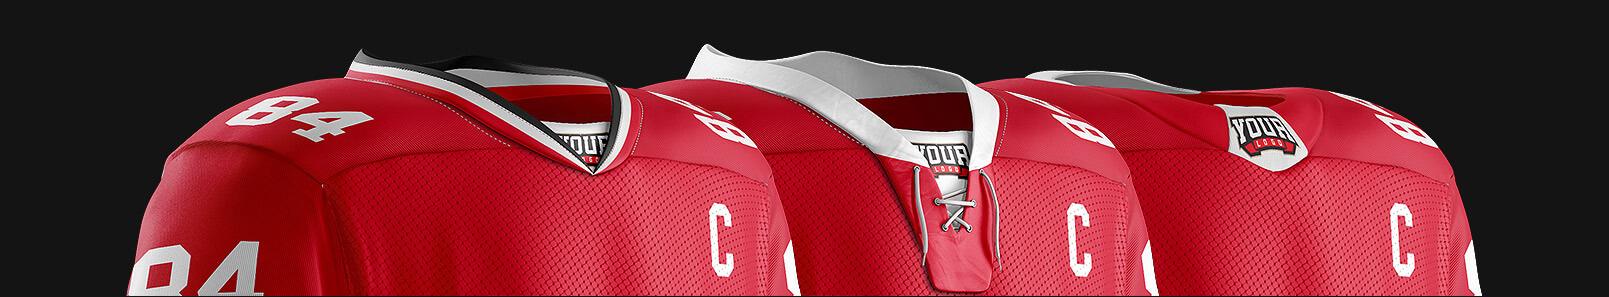 Hockey-jersey-collars1